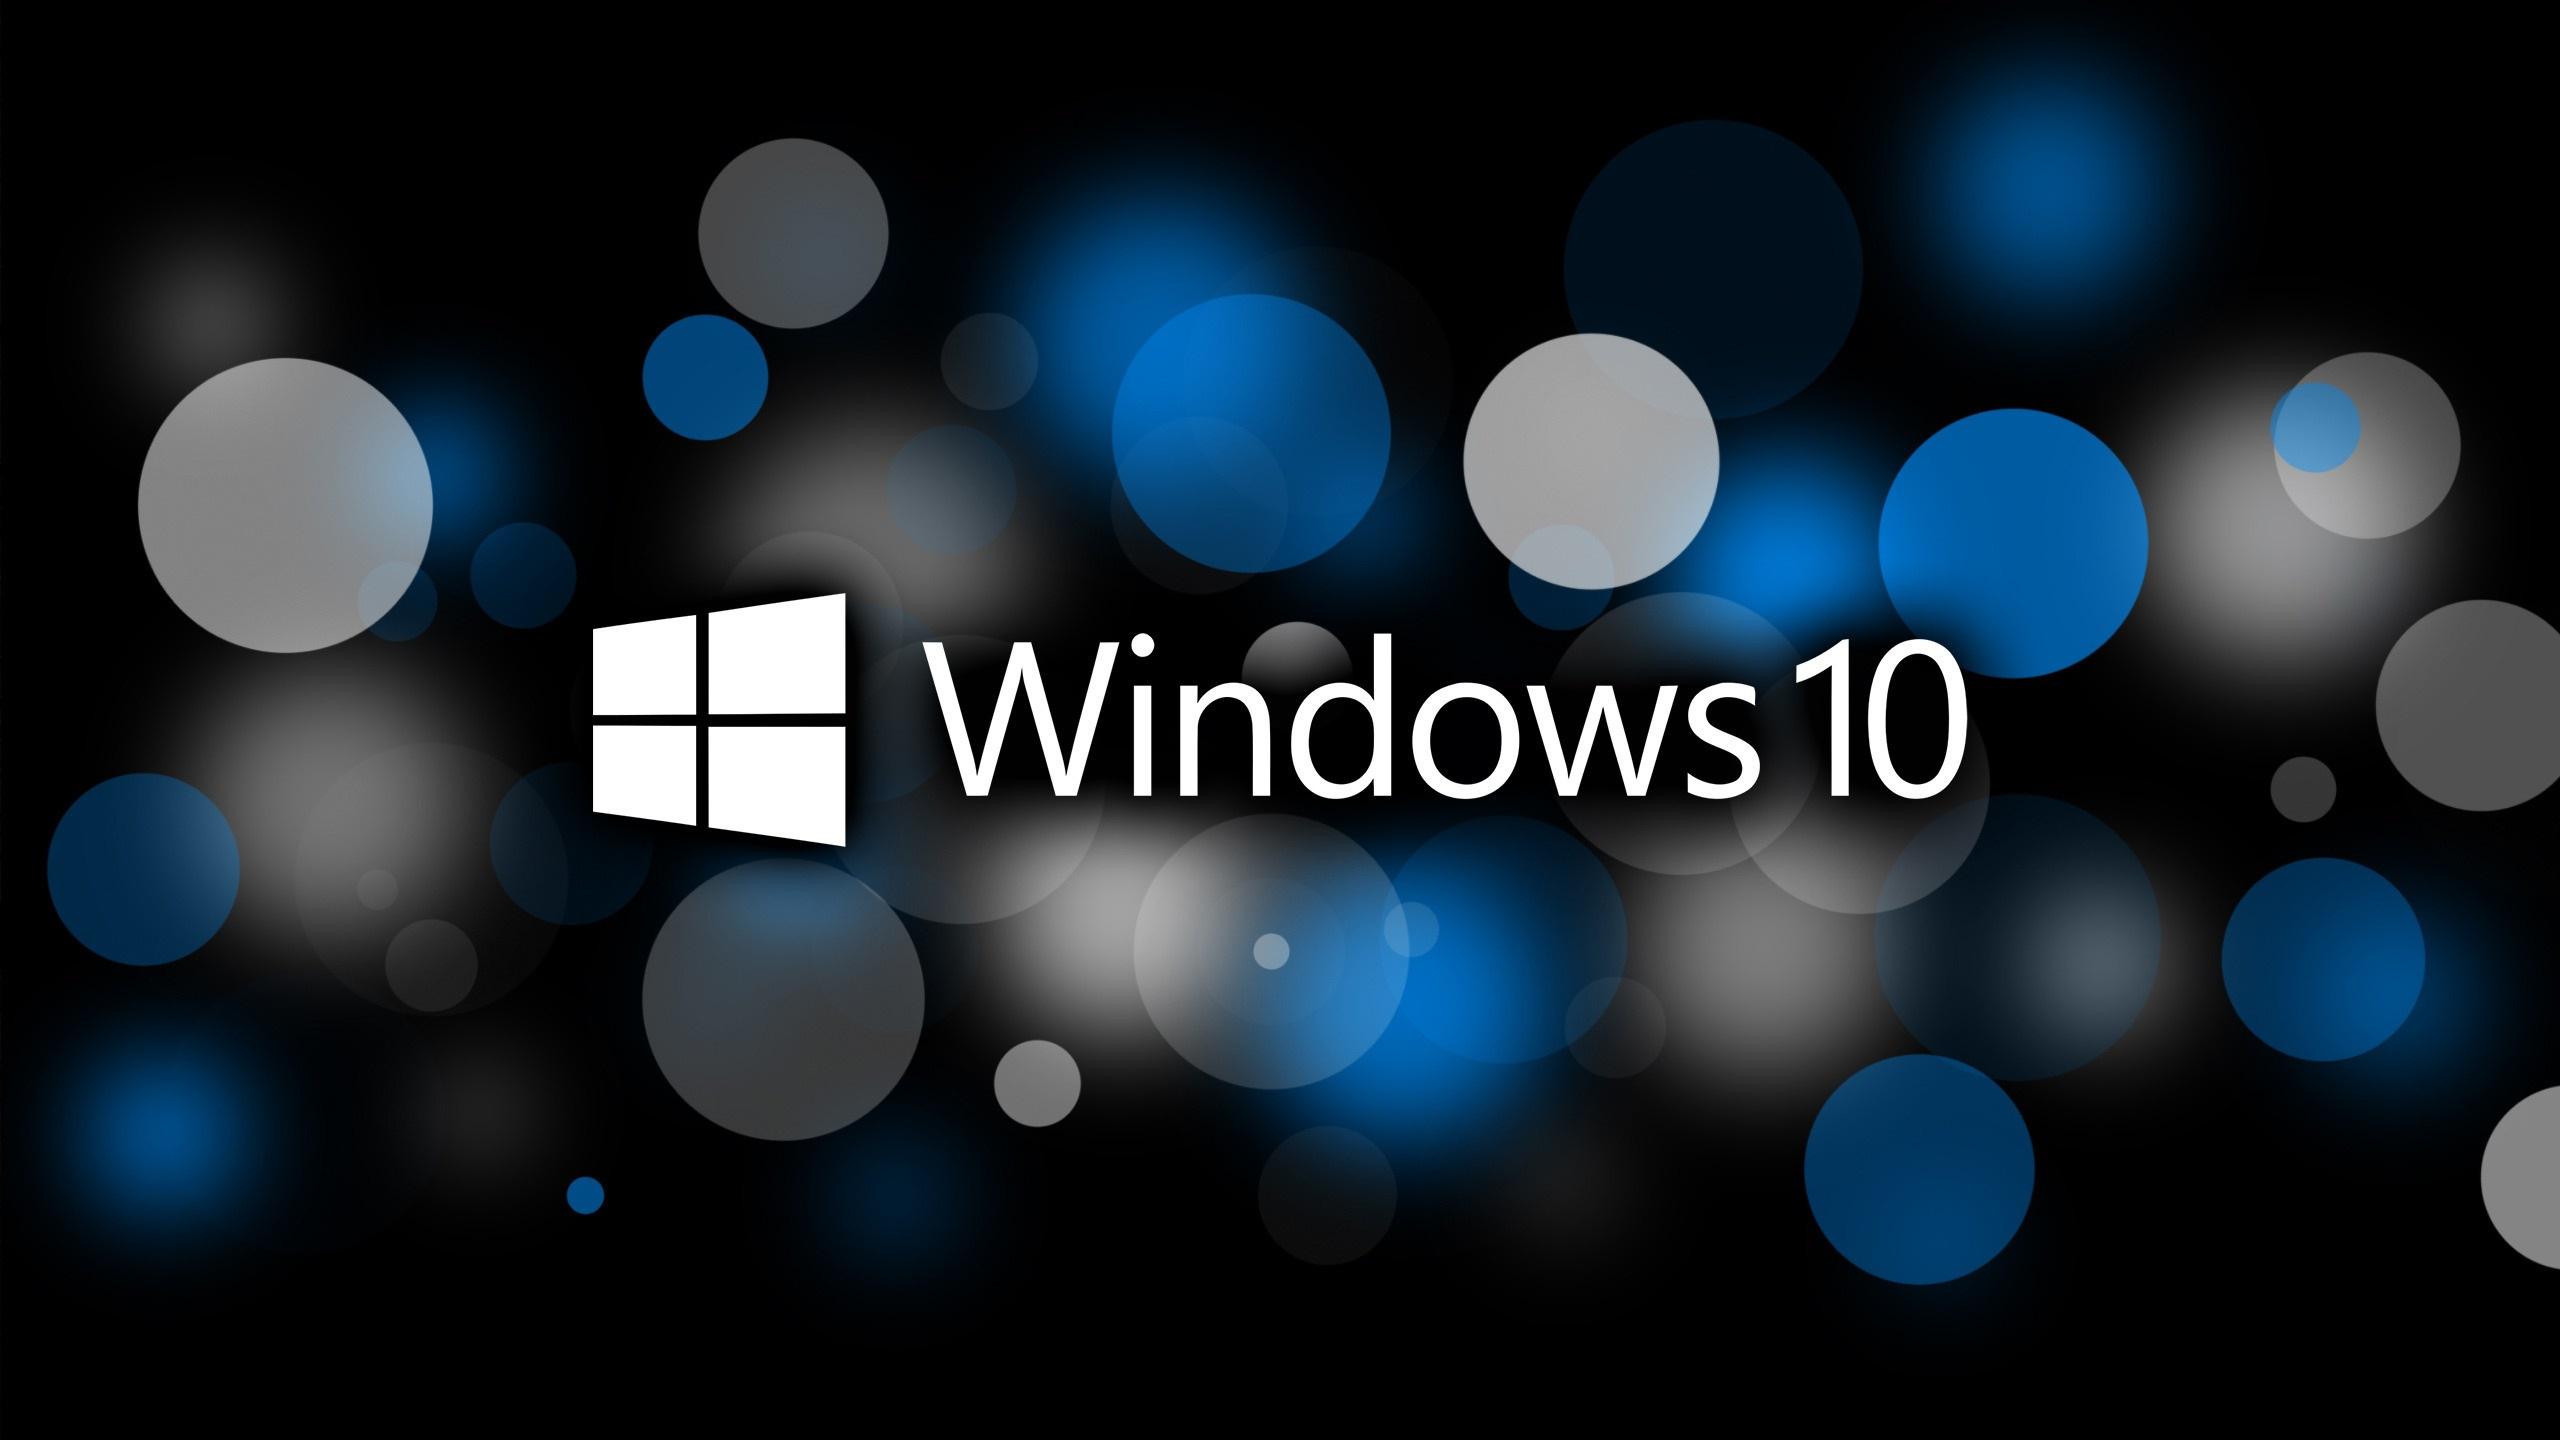 Microsoft-Windows-10-system-logo-circles-creative-design_2560x1440